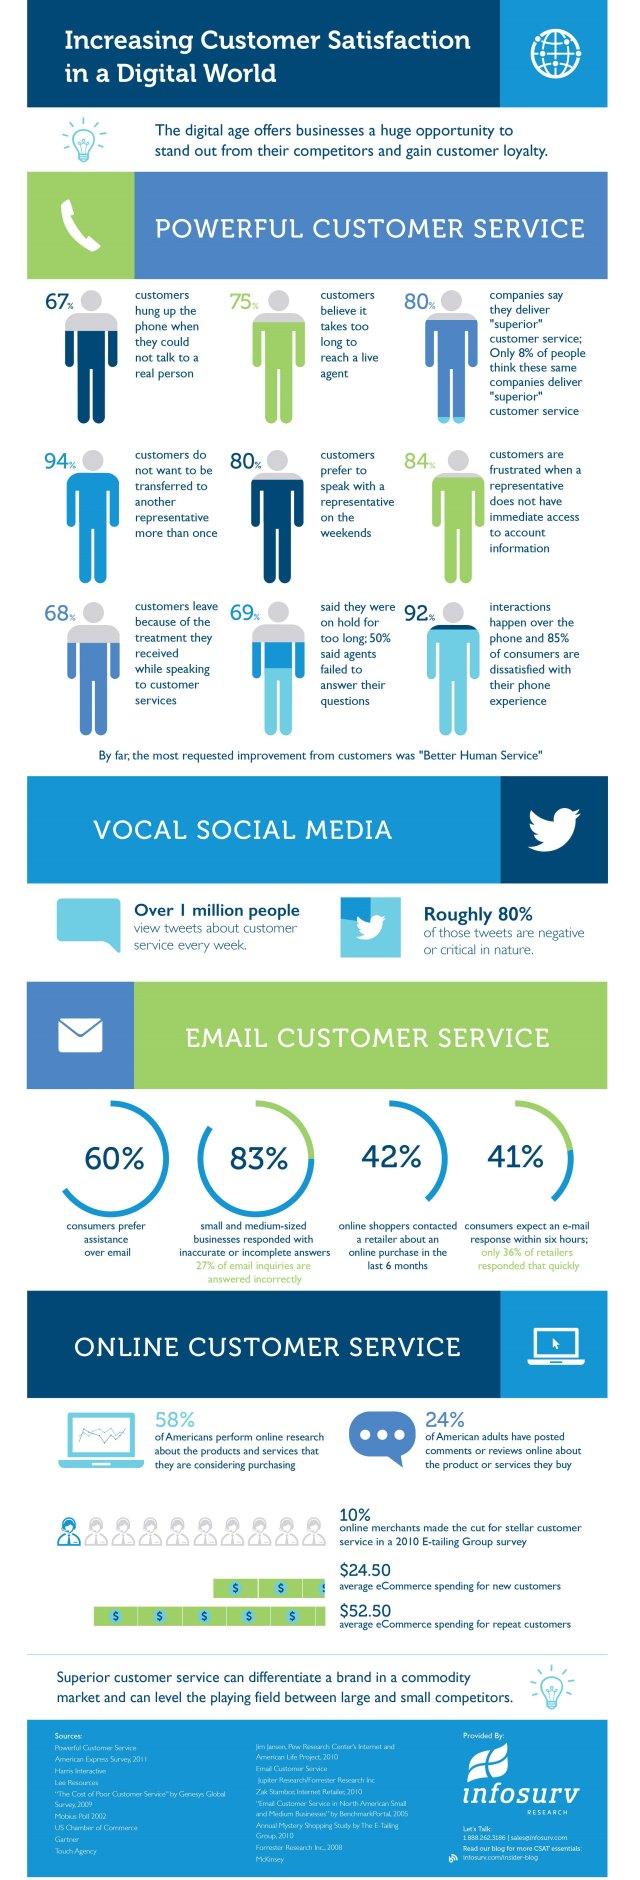 customer satisfaction and social media